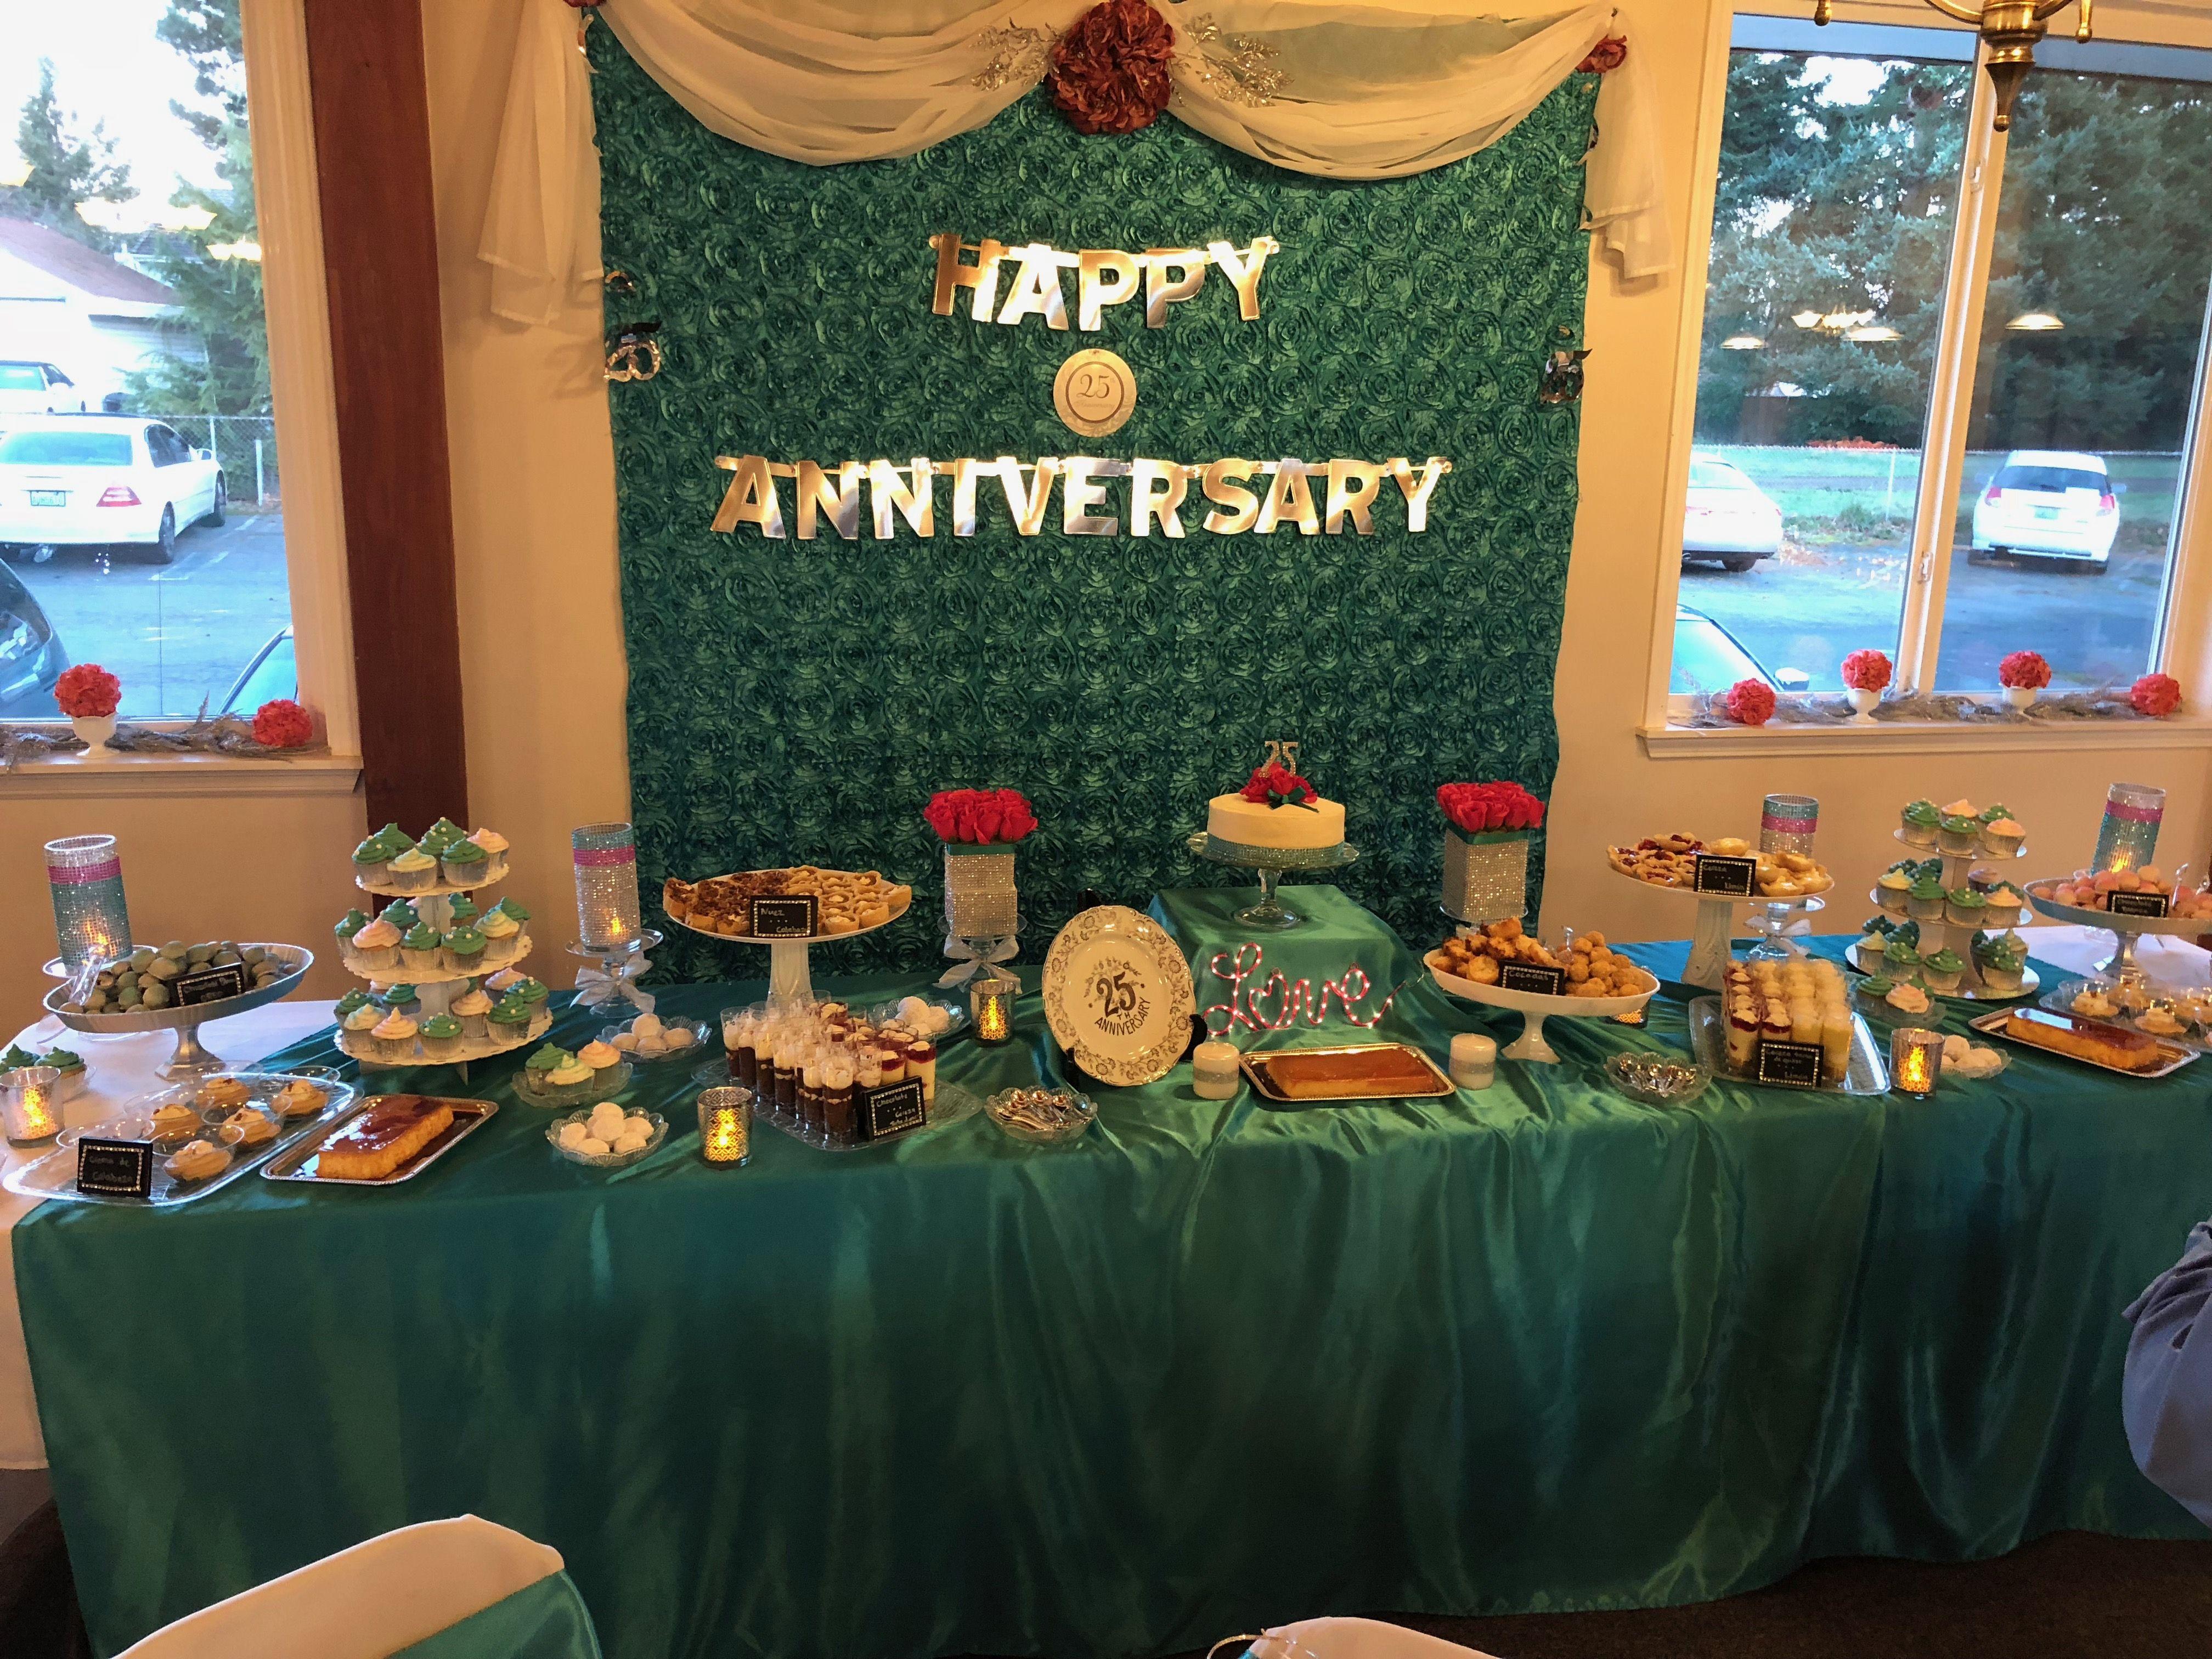 Pin by Joy on Martha's 25 Anniversary Ideas | Table ...